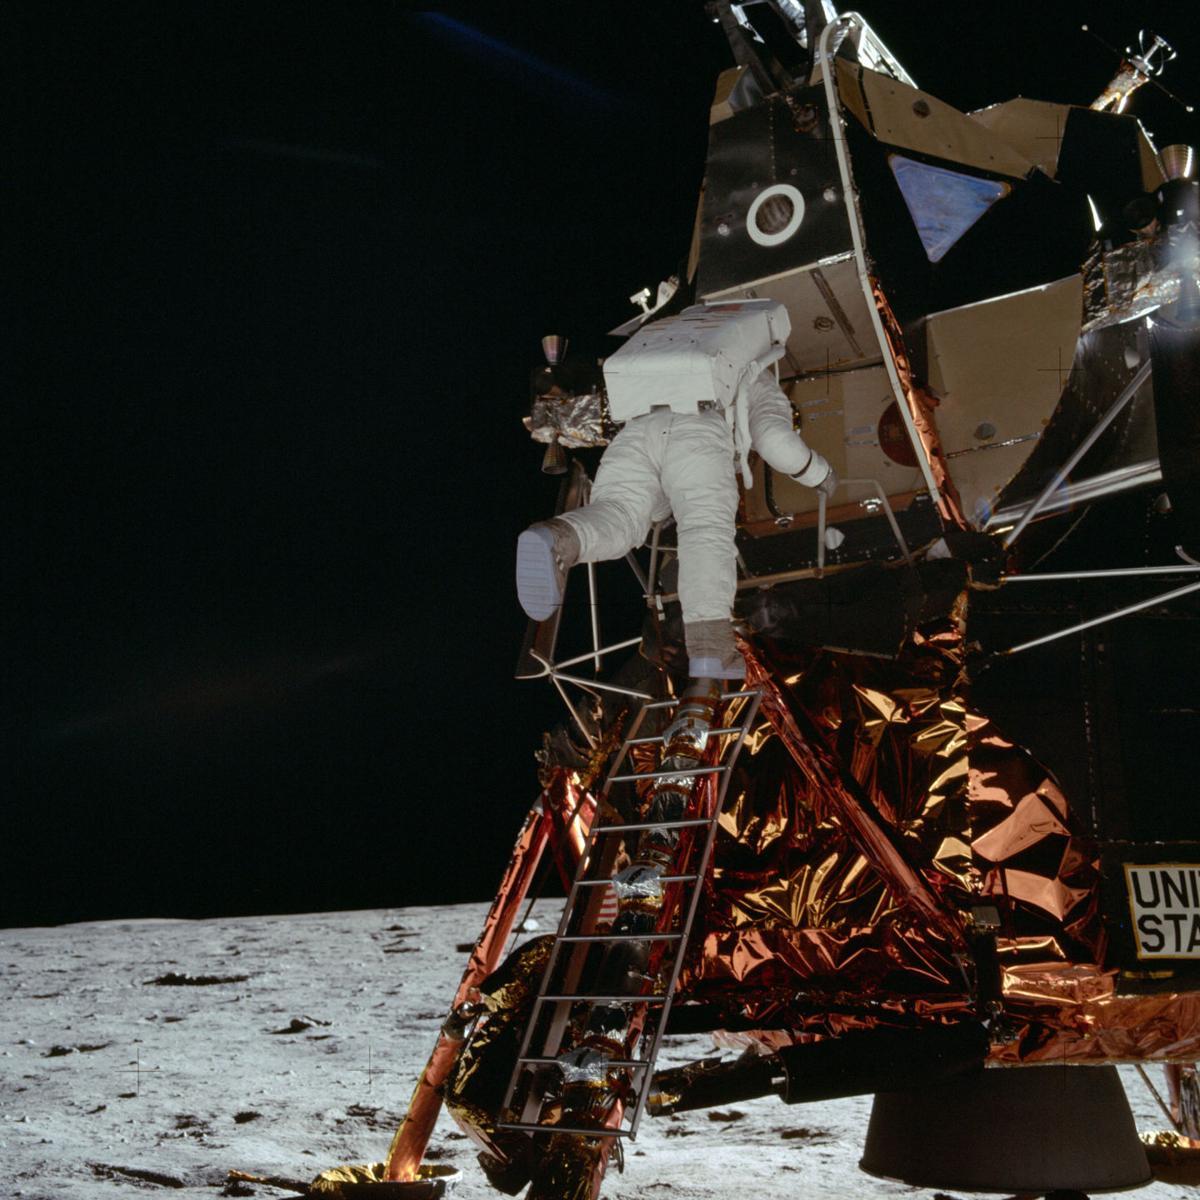 Apollo 11 Mission image - Astronaut Edwin Aldrin descends the Lunar Module ladder